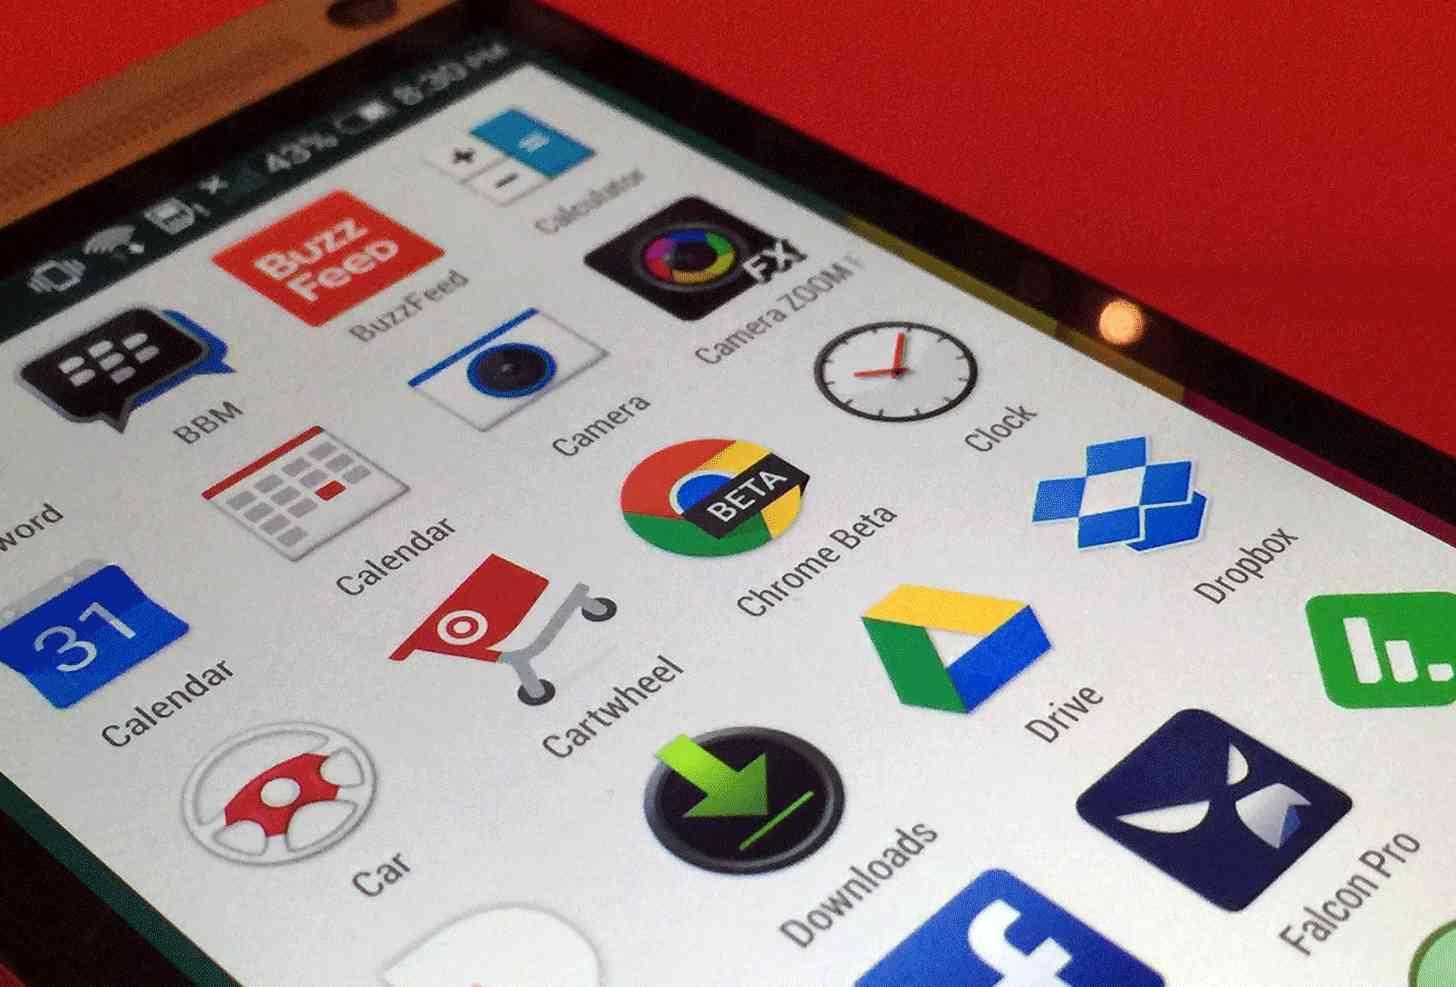 Chrome Beta hits version 45, brings Chrome Custom Tabs and more